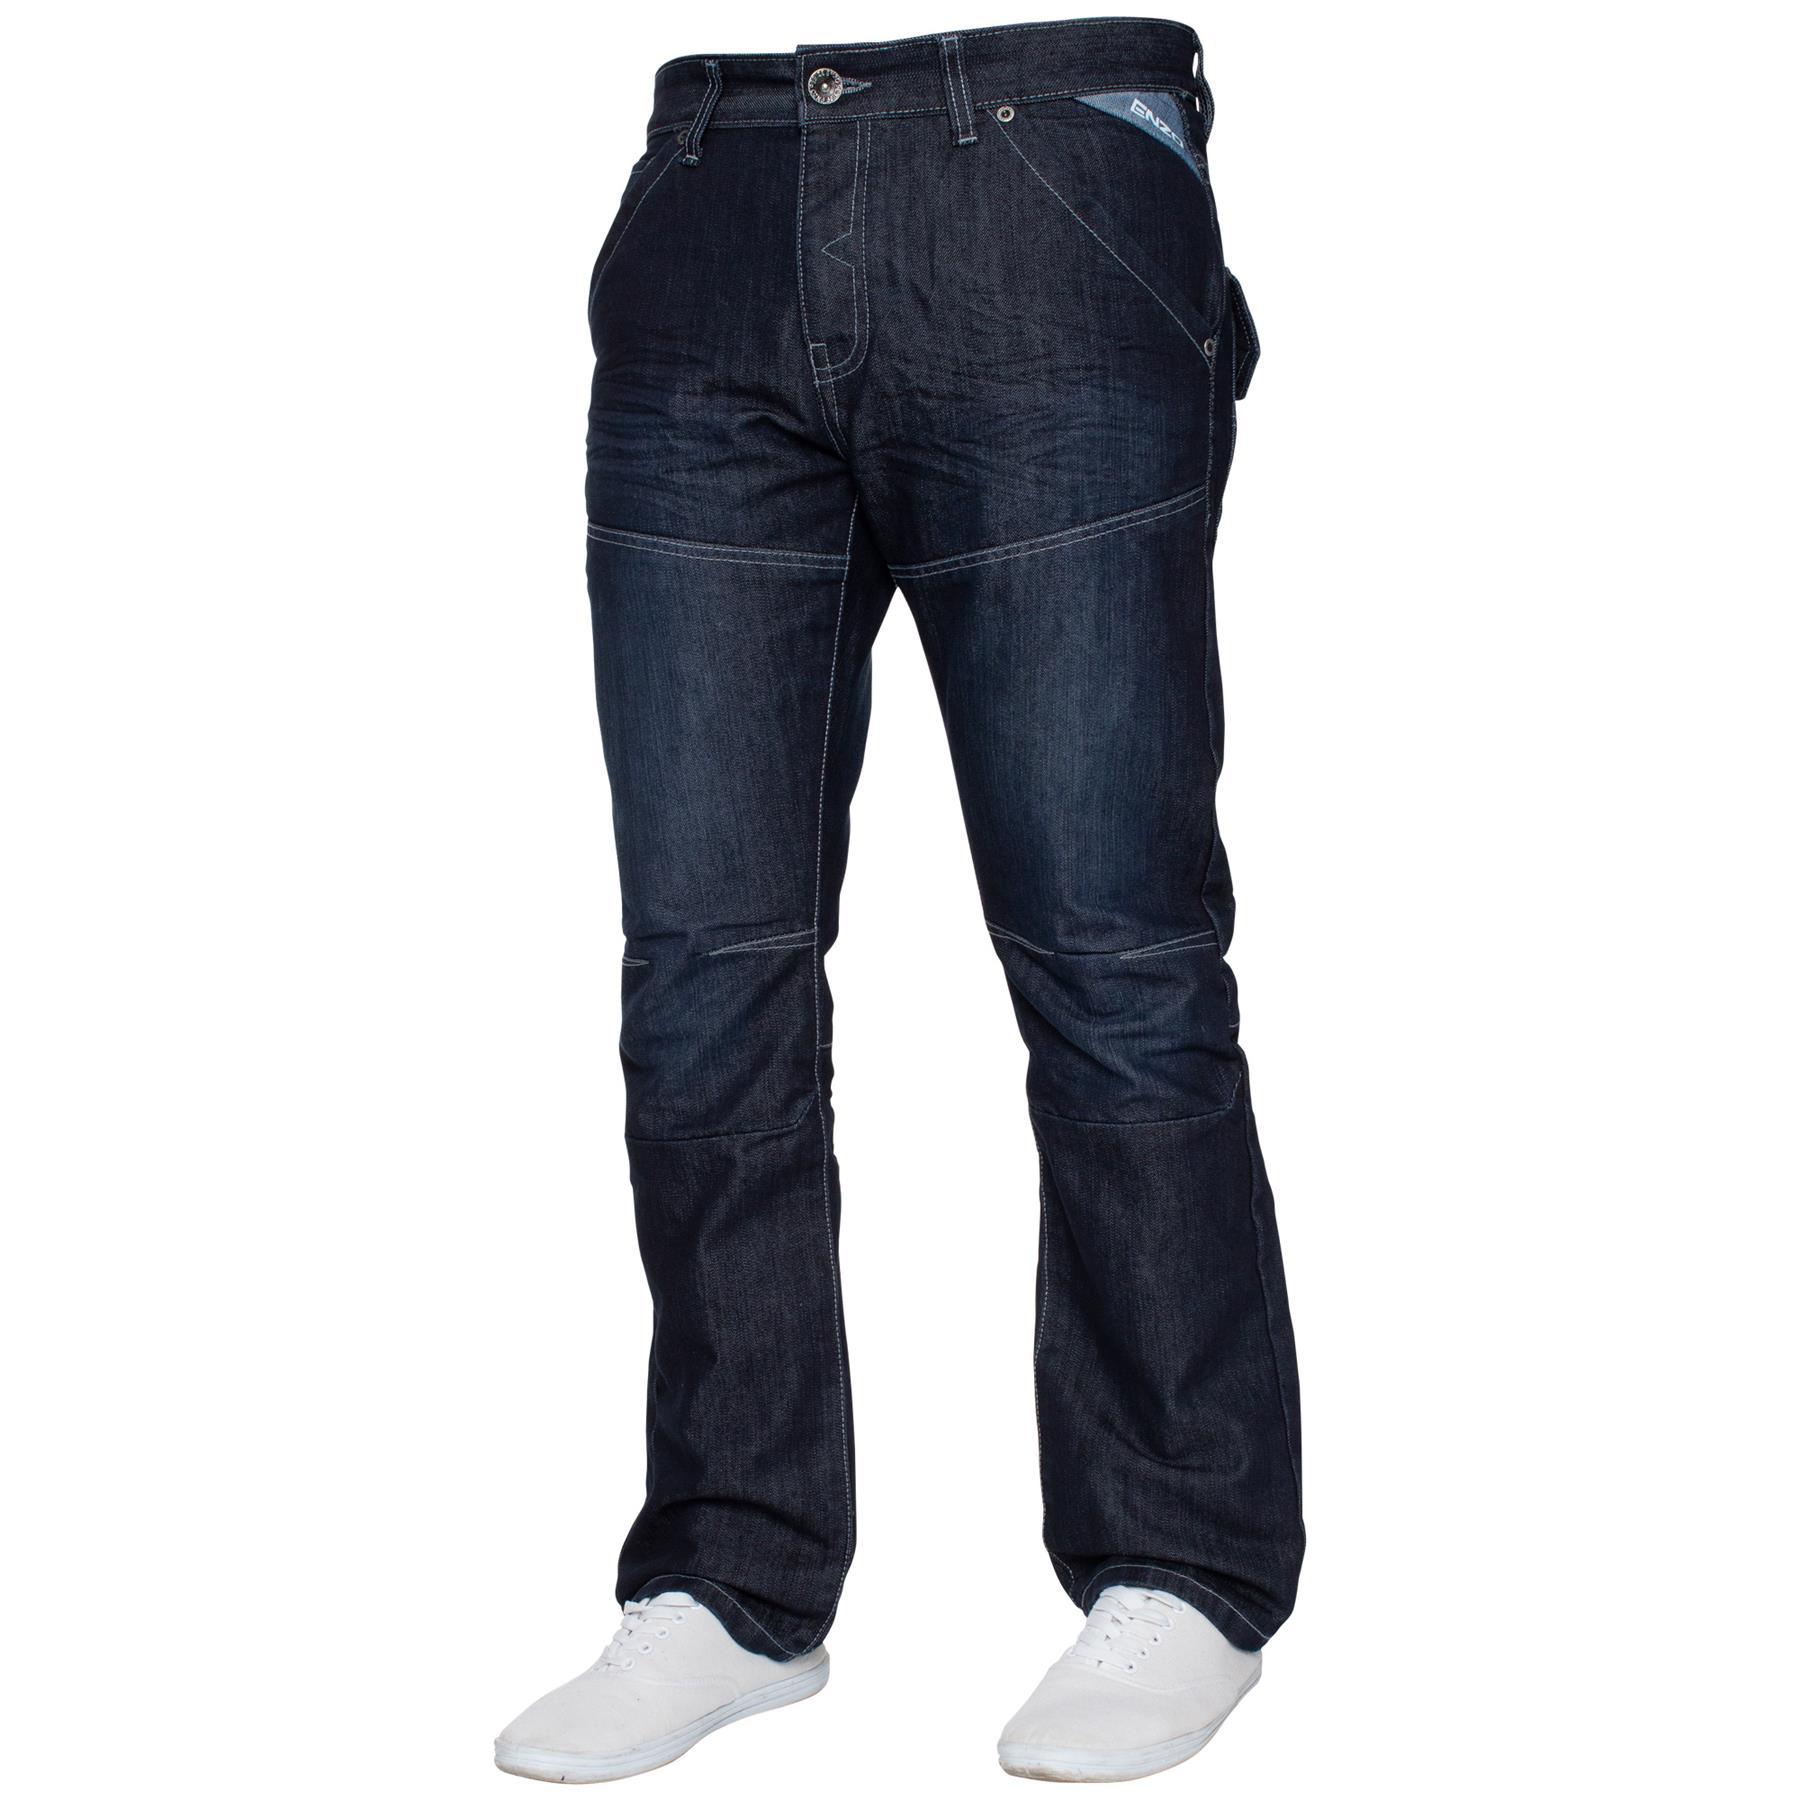 Enzo-Mens-Big-Tall-Jeans-Leg-King-Size-Denim-Pants-Chino-Trousers-Pants-44-034-60-034 thumbnail 71